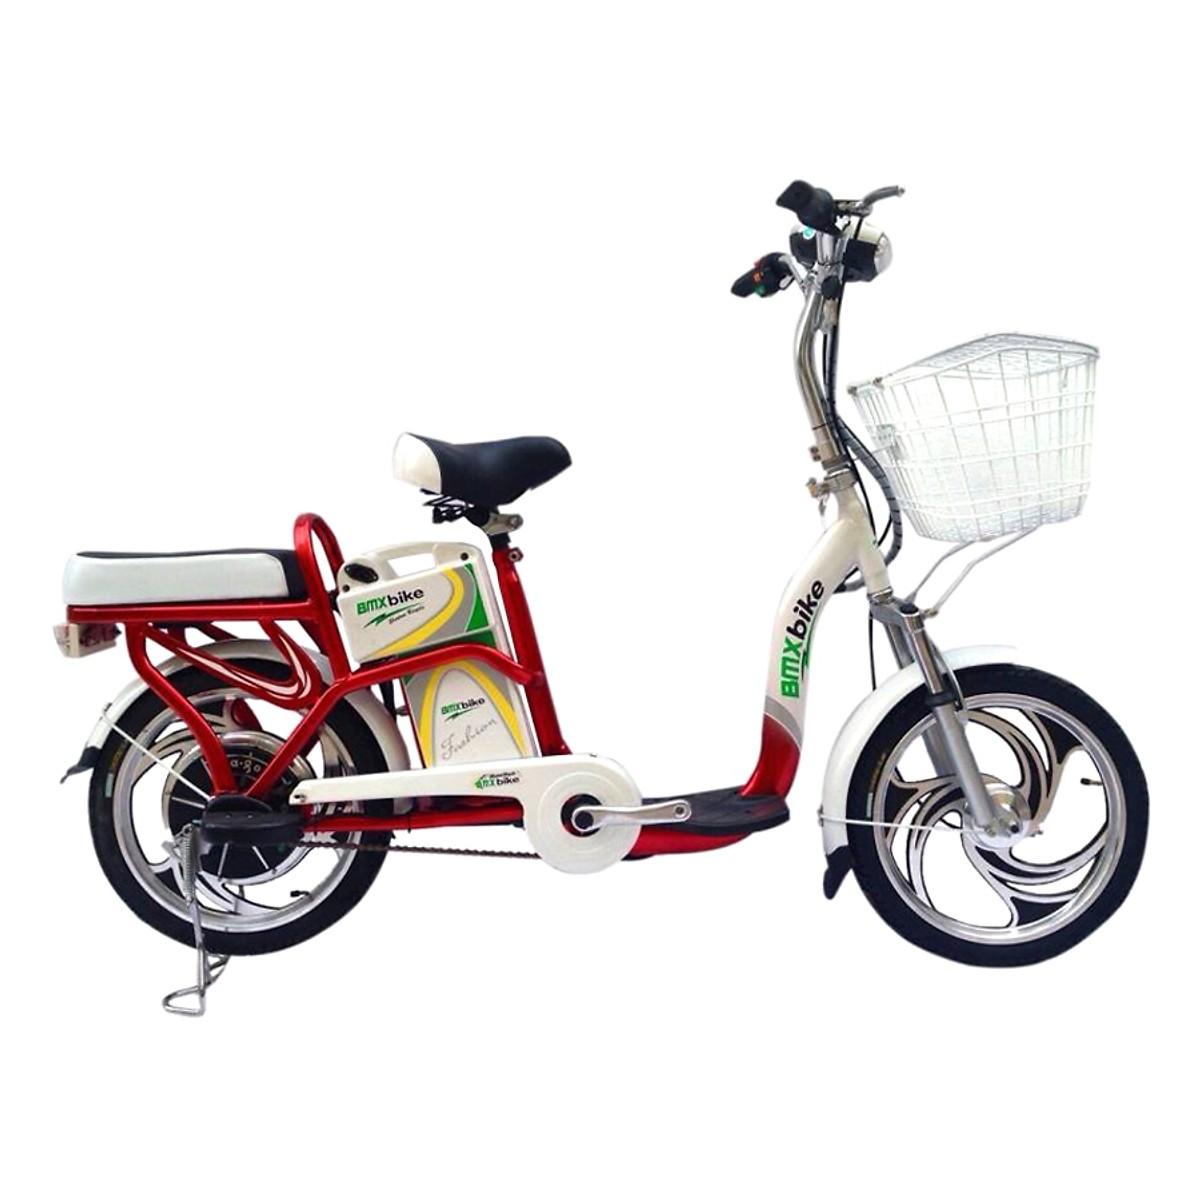 Xe Đạp Điện BMX Bike